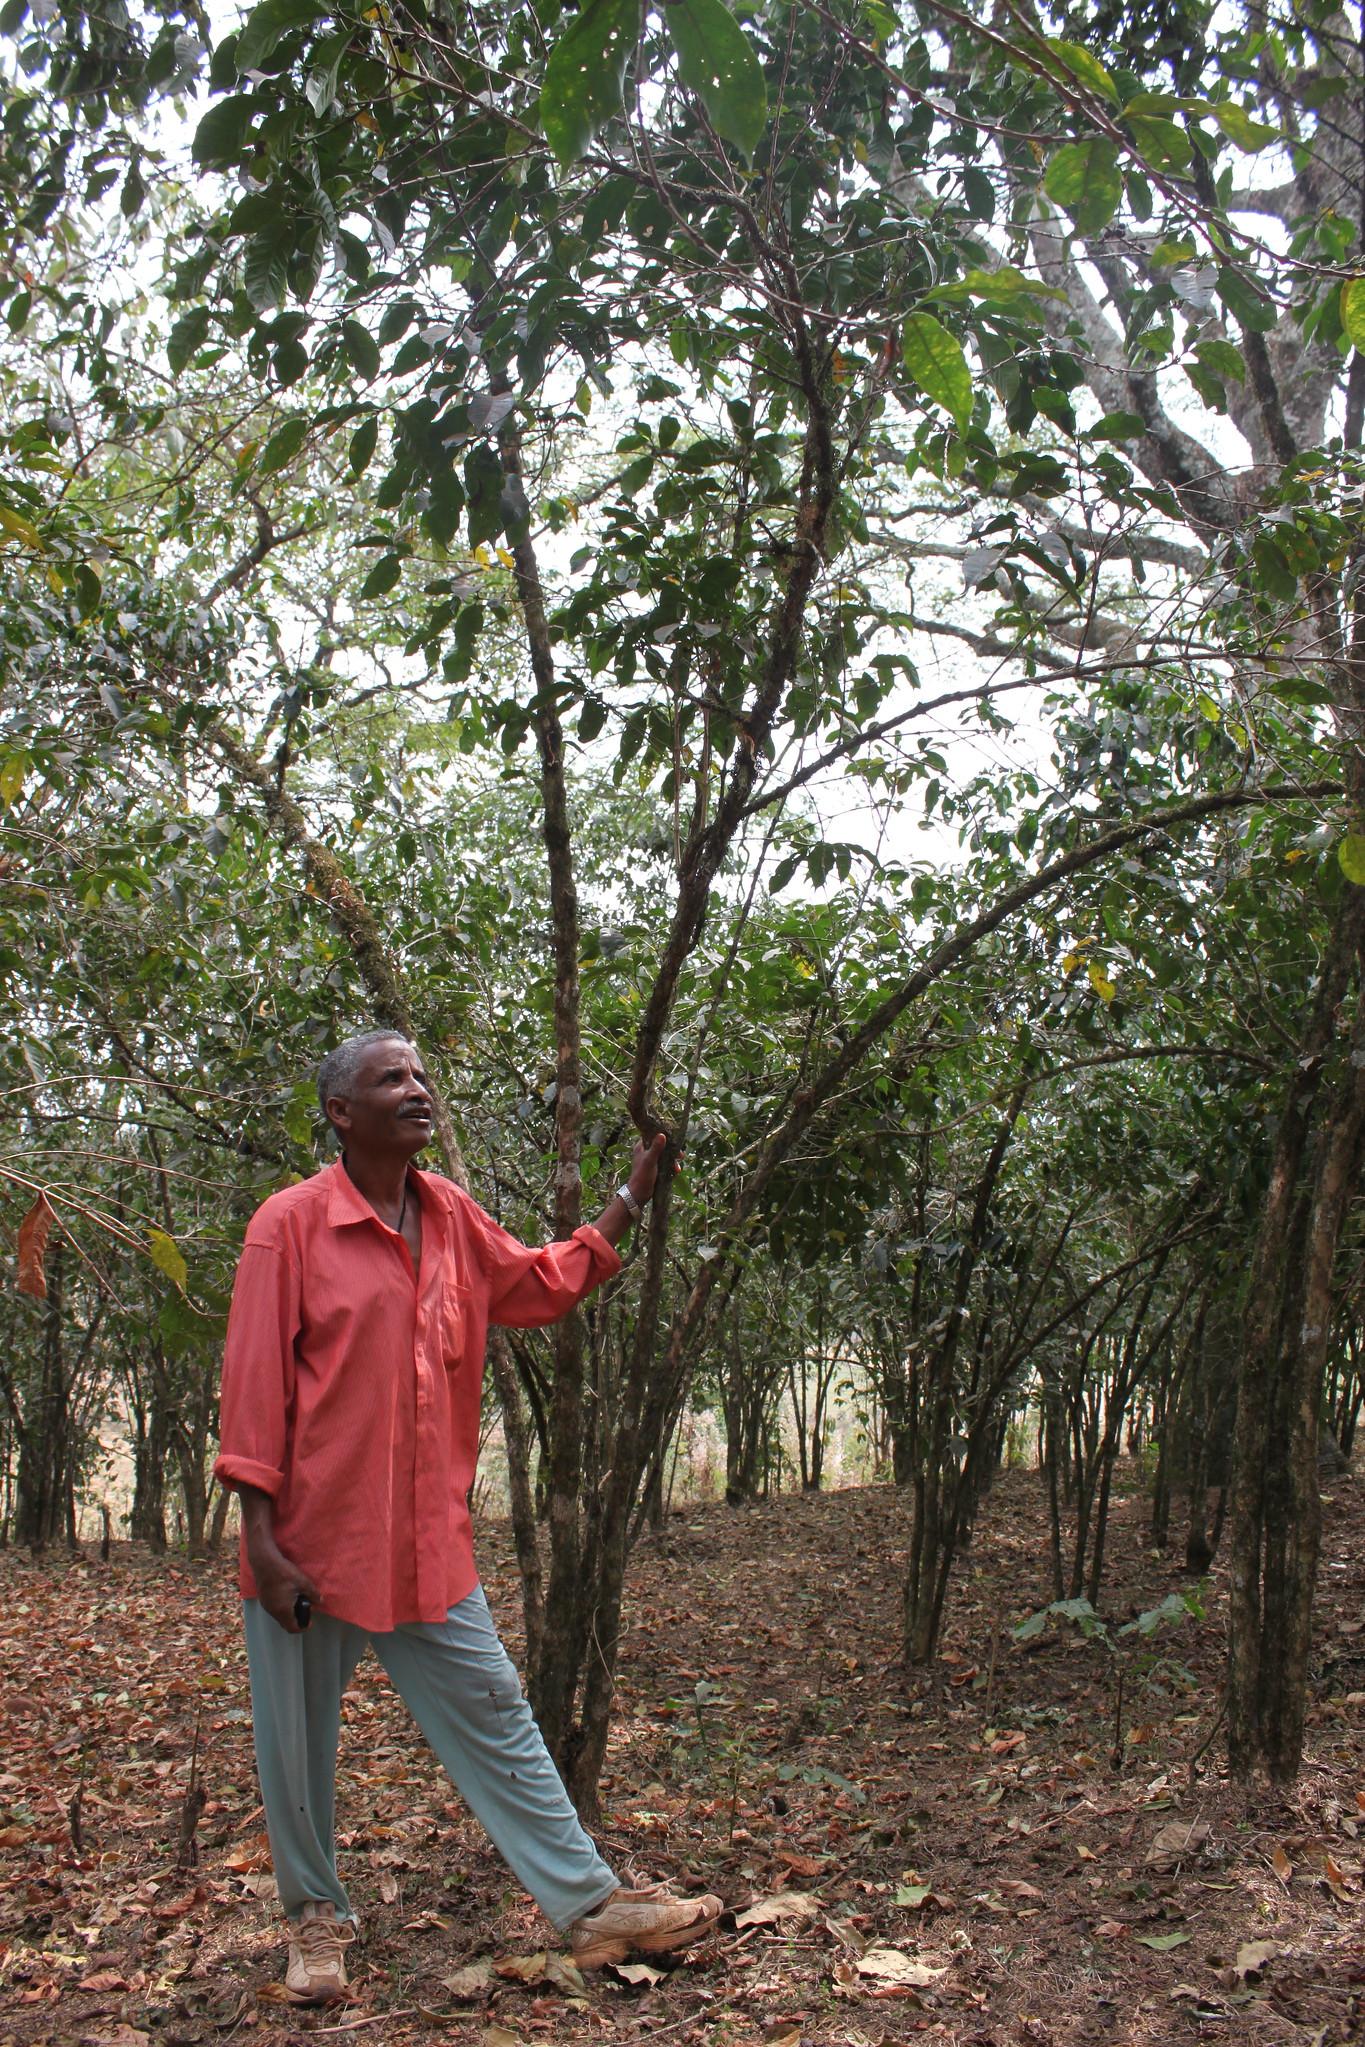 Kebge Wubeshet: Coffeefarmer from Hana Boske Cooperative